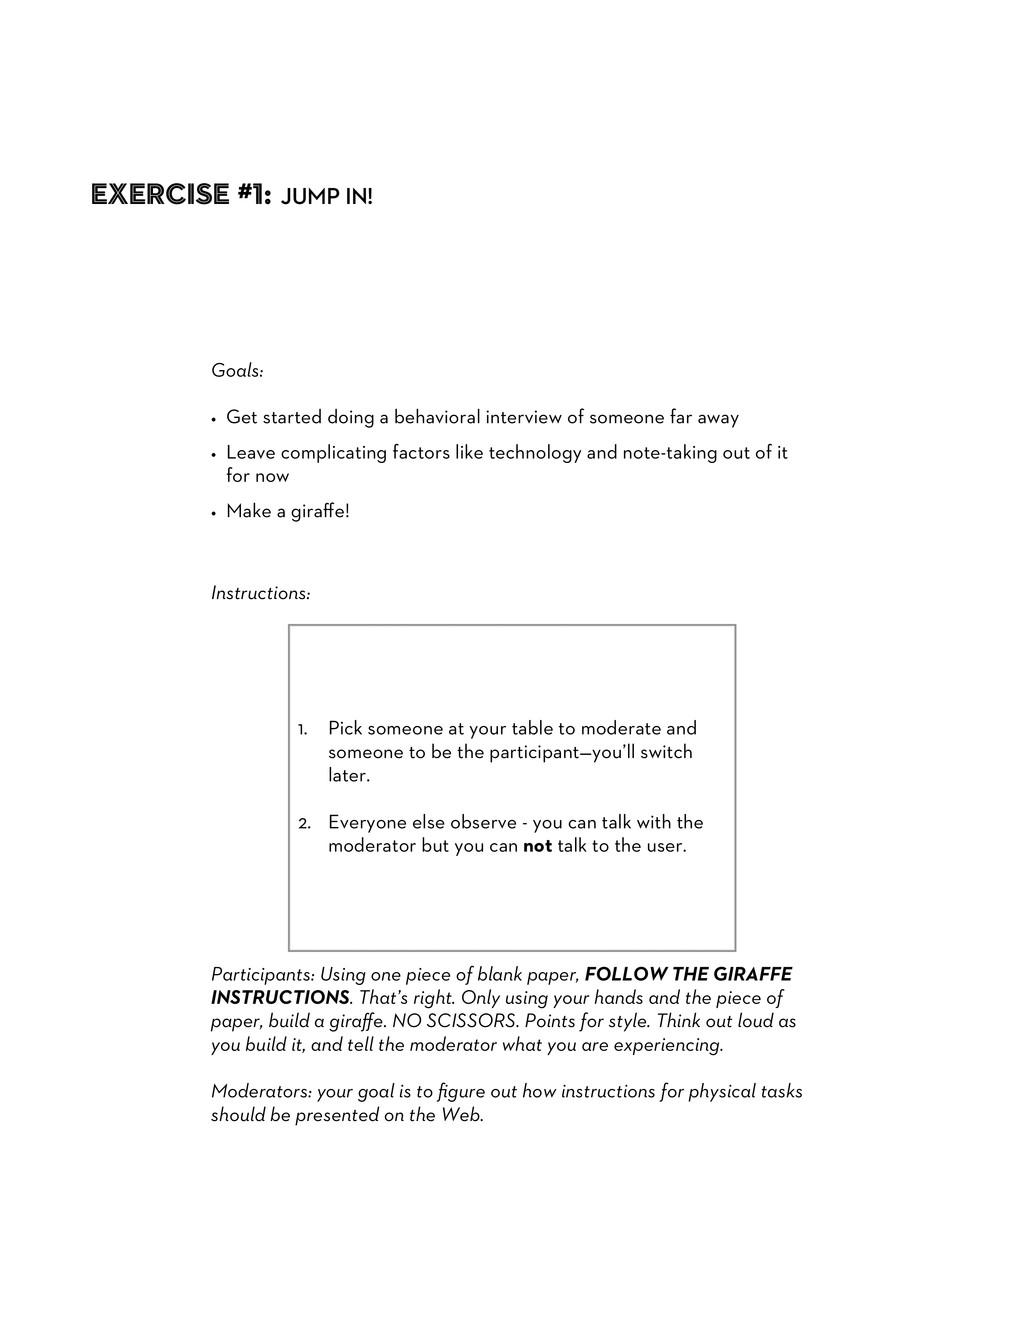 Goals: • Get started doing a behavioral intervi...